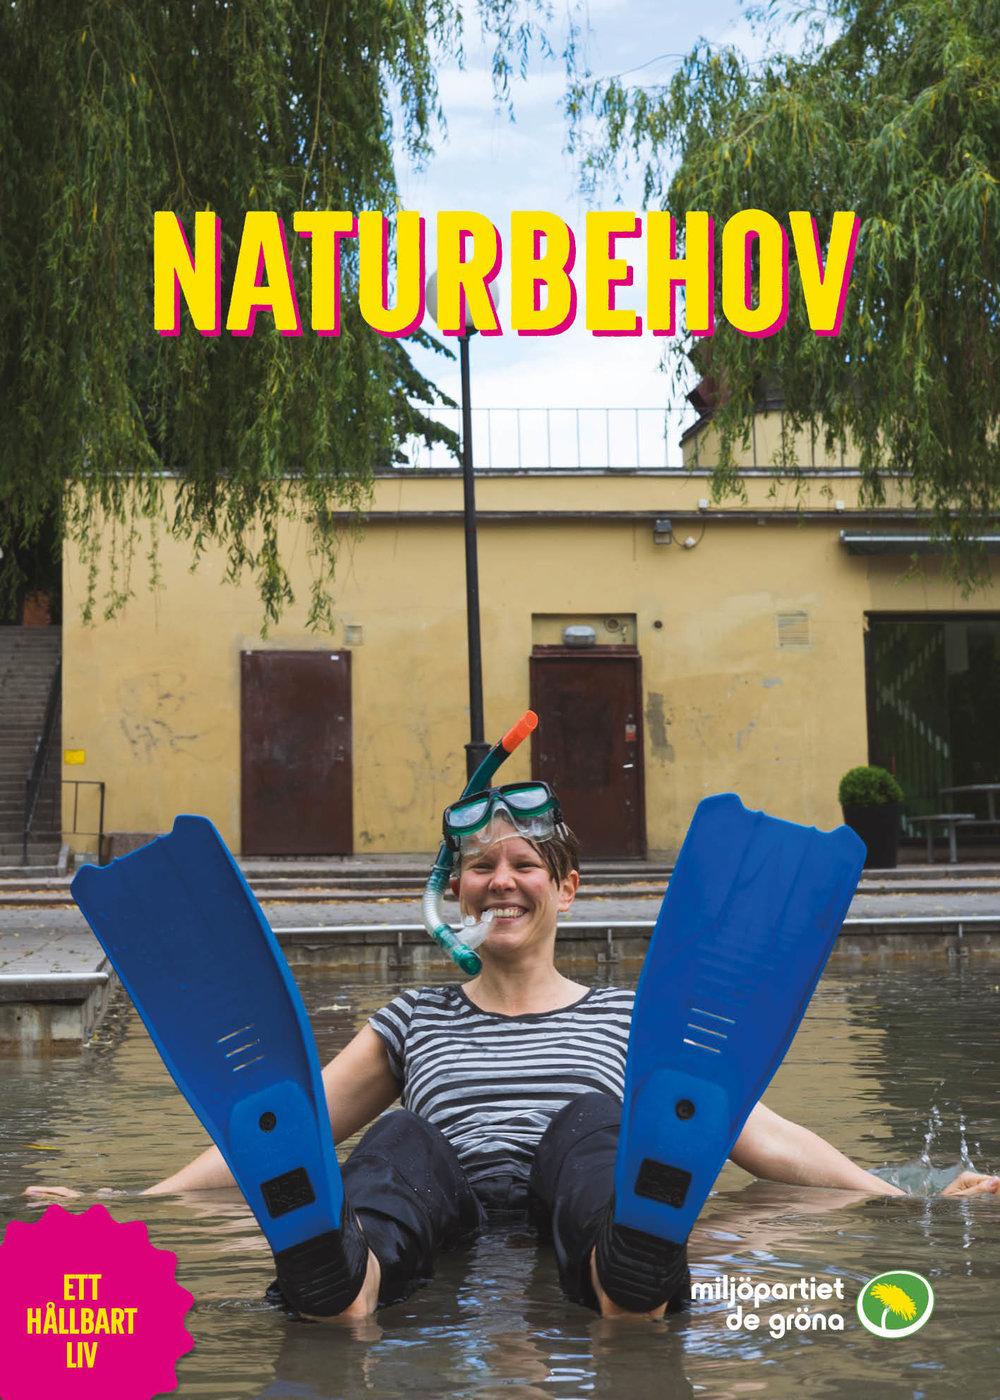 Naturbehov_Print_KR2.jpg